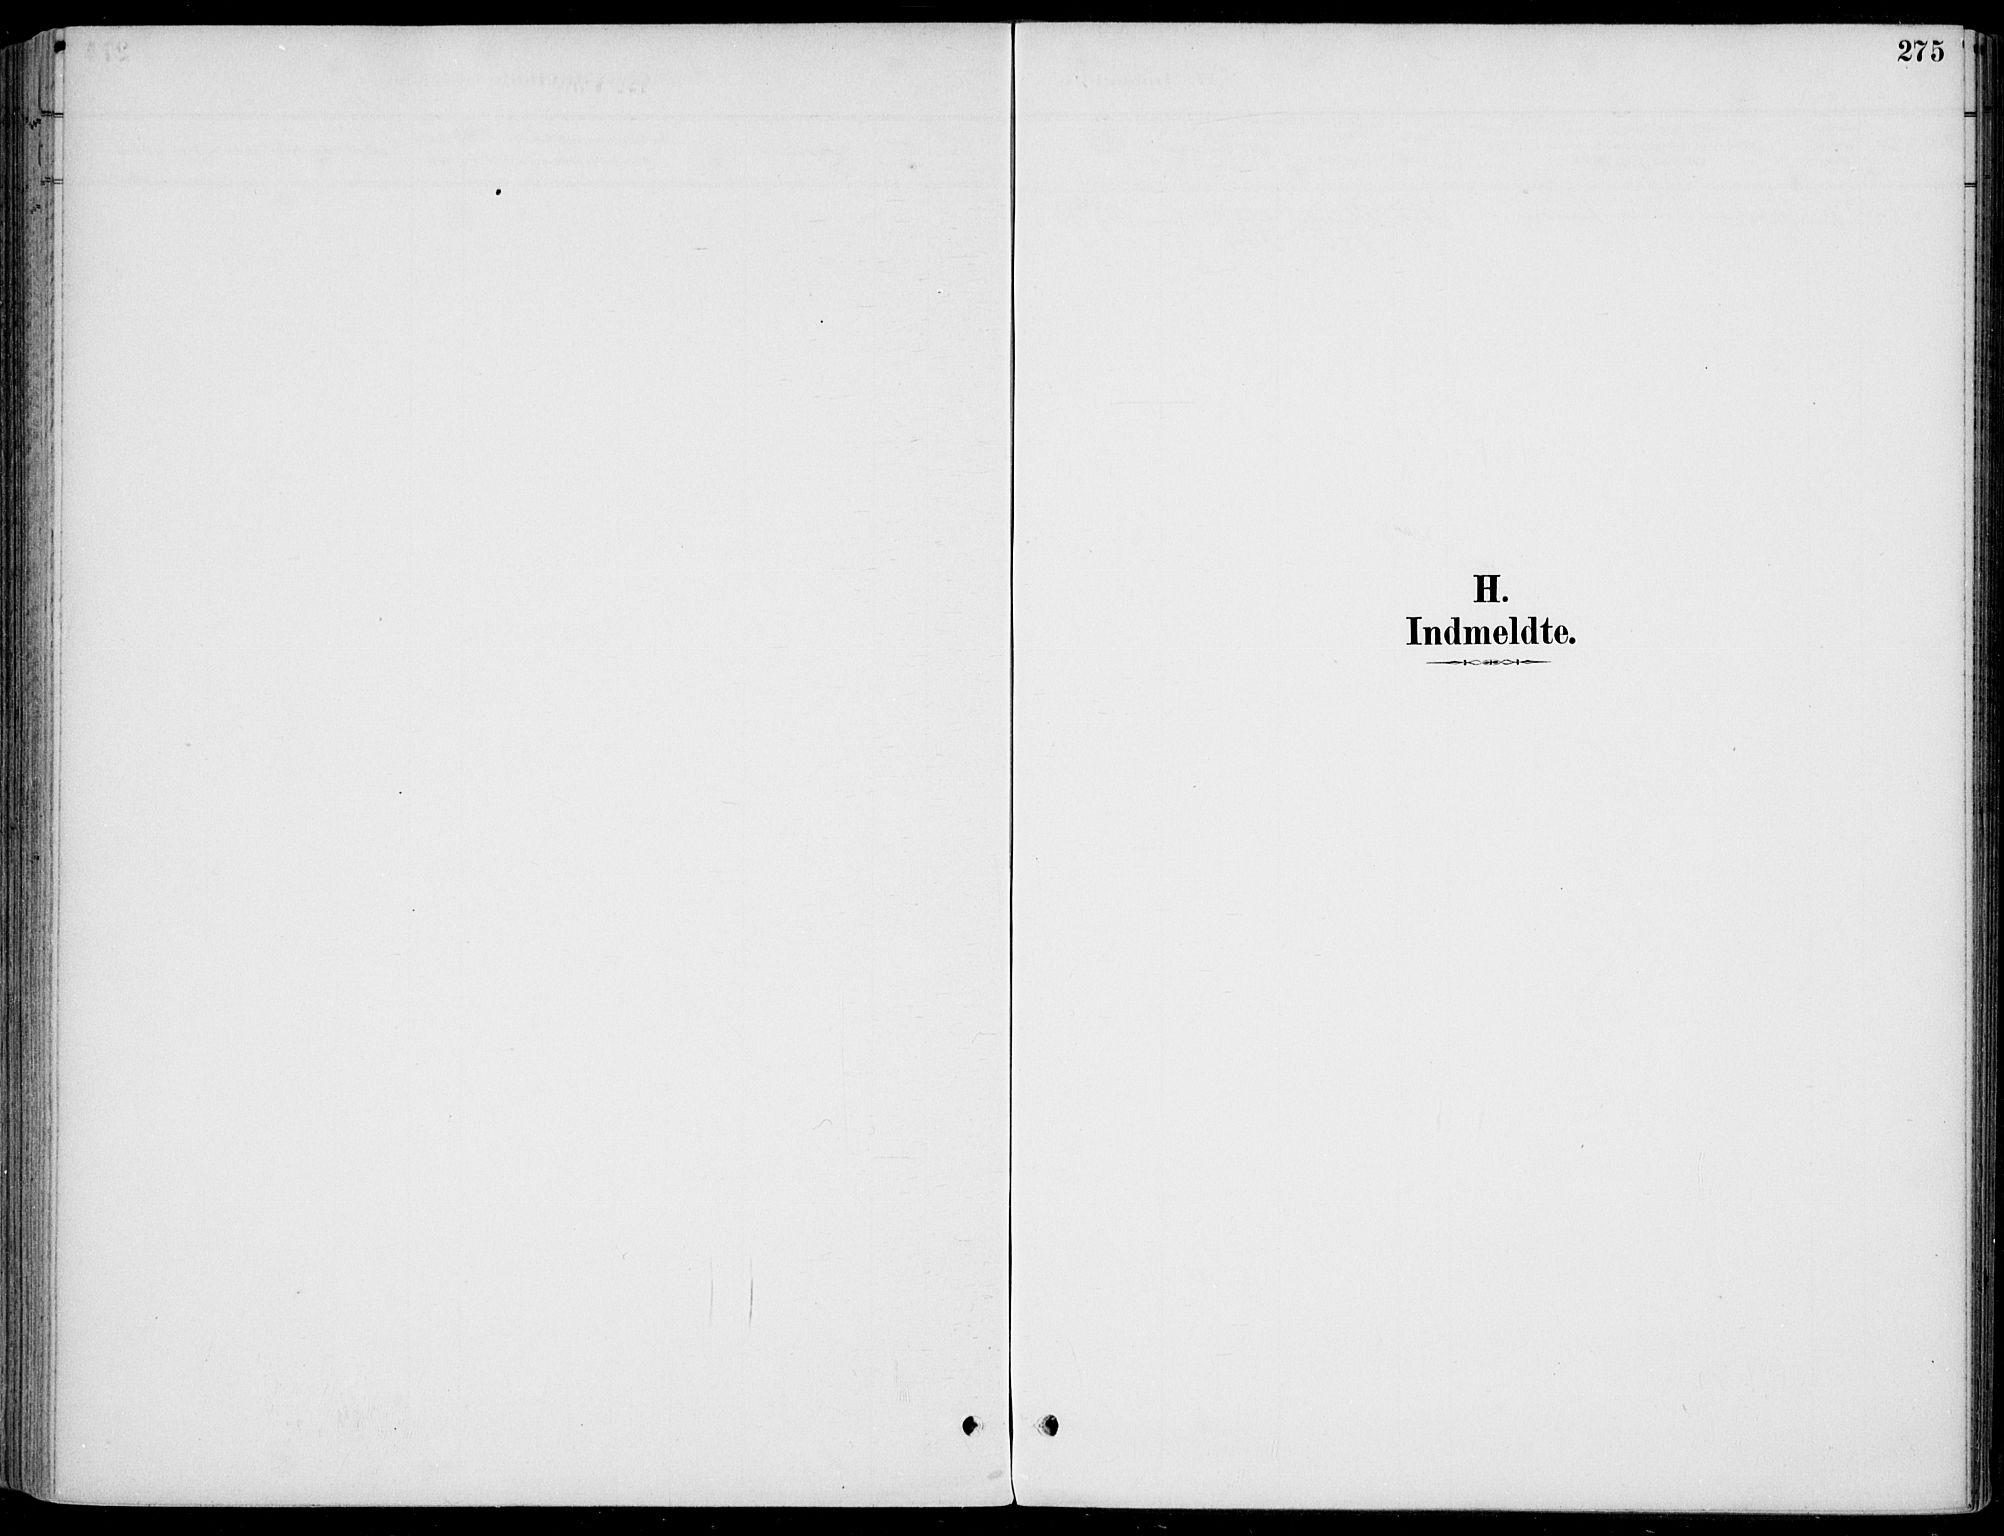 SAKO, Sigdal kirkebøker, F/Fb/L0001: Ministerialbok nr. II 1, 1888-1900, s. 275